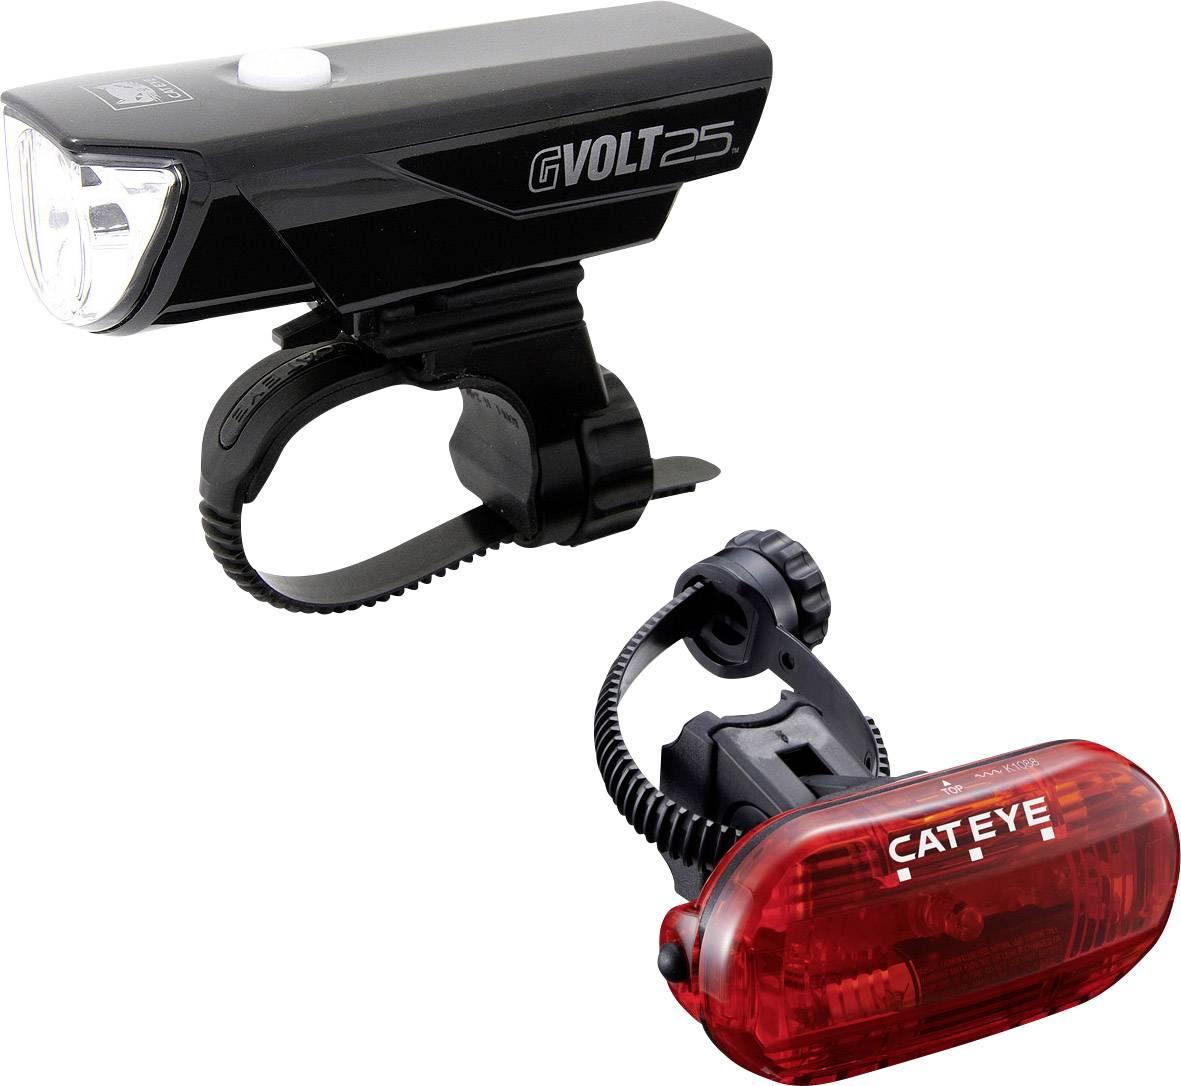 Cateye Kit illuminazione bicic